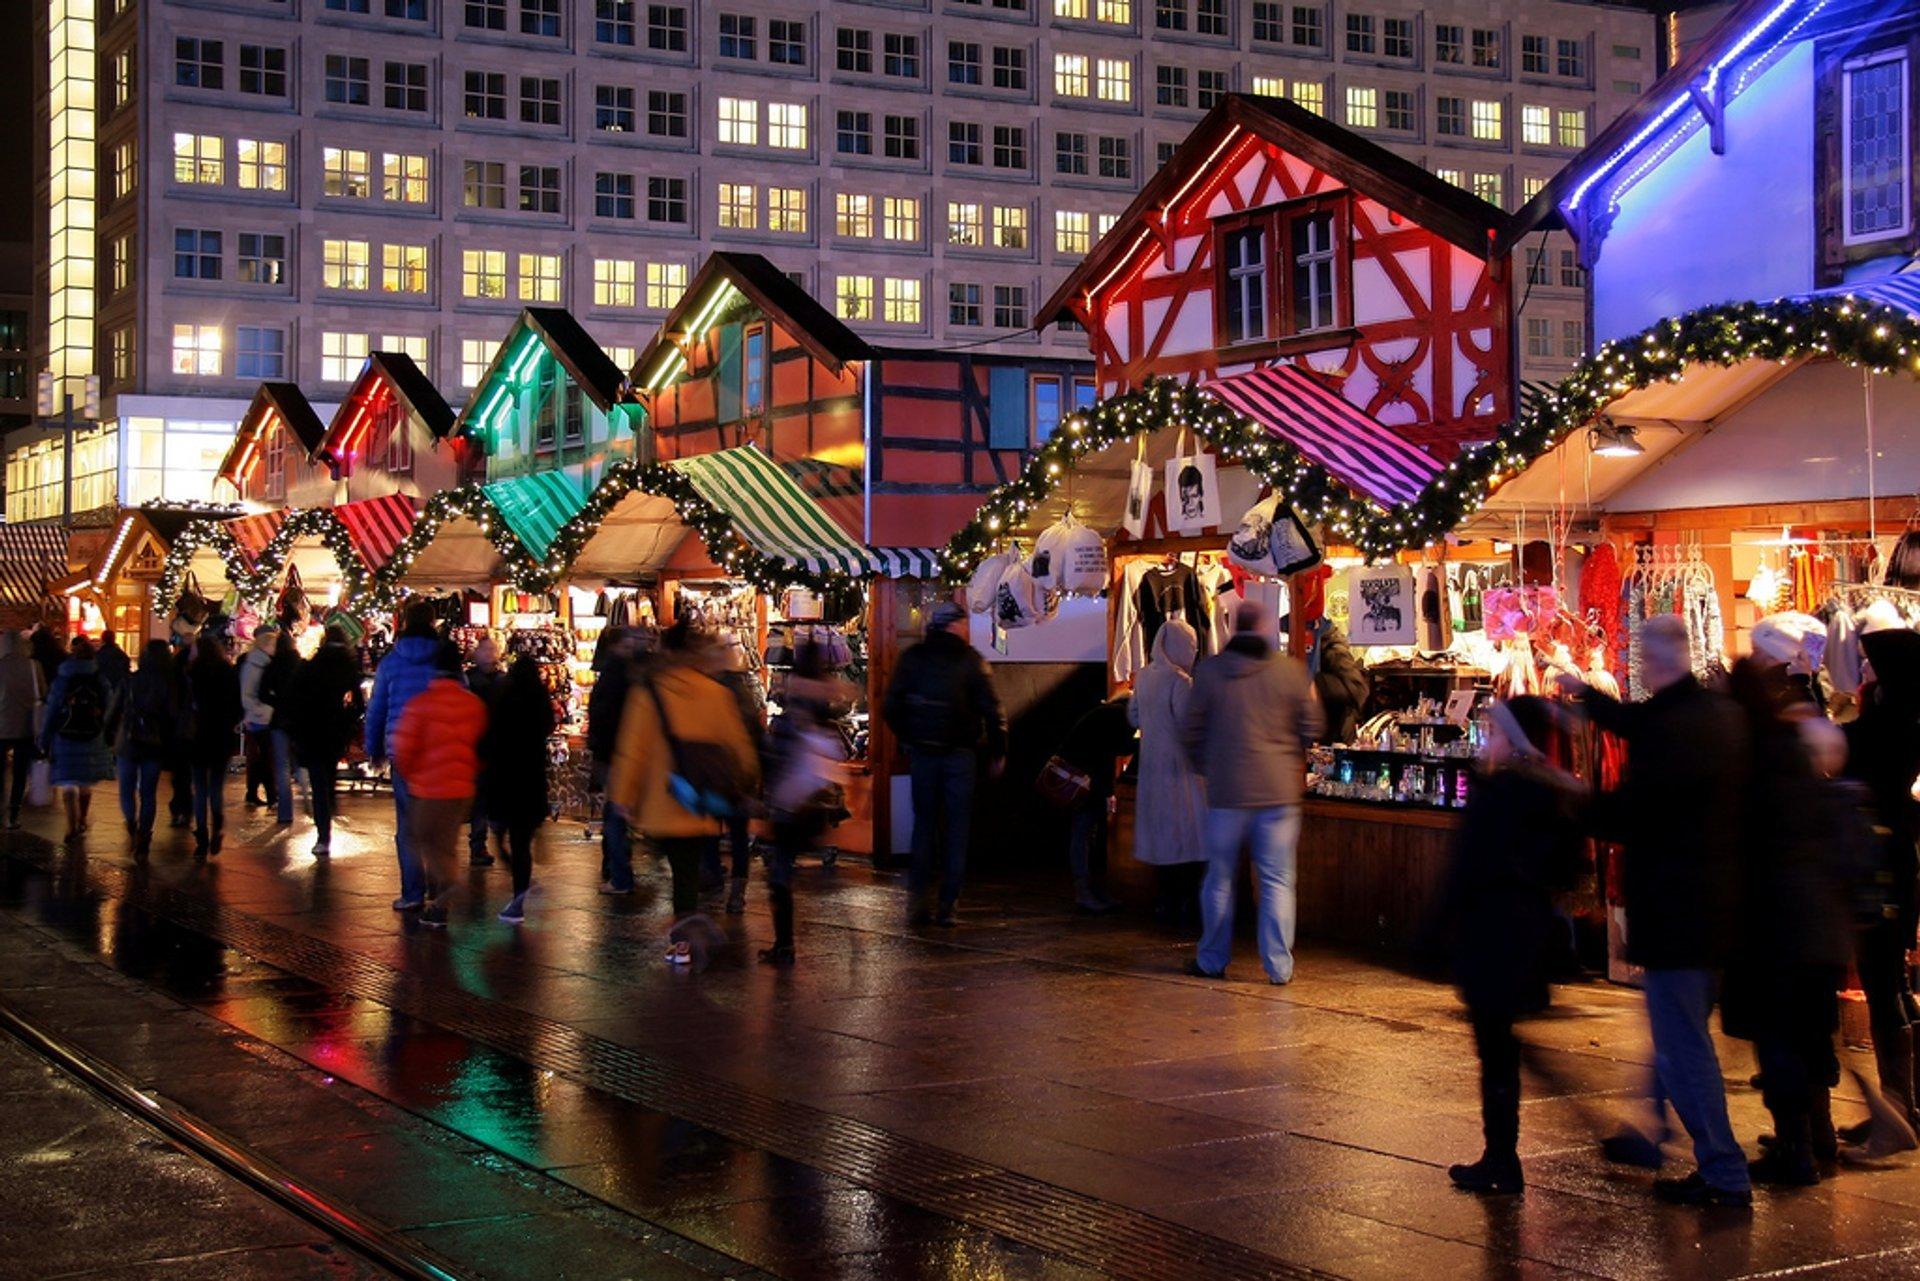 Berlin Christmas Market 2019 Christmas Markets 2019 2020 in Berlin   Dates & Map